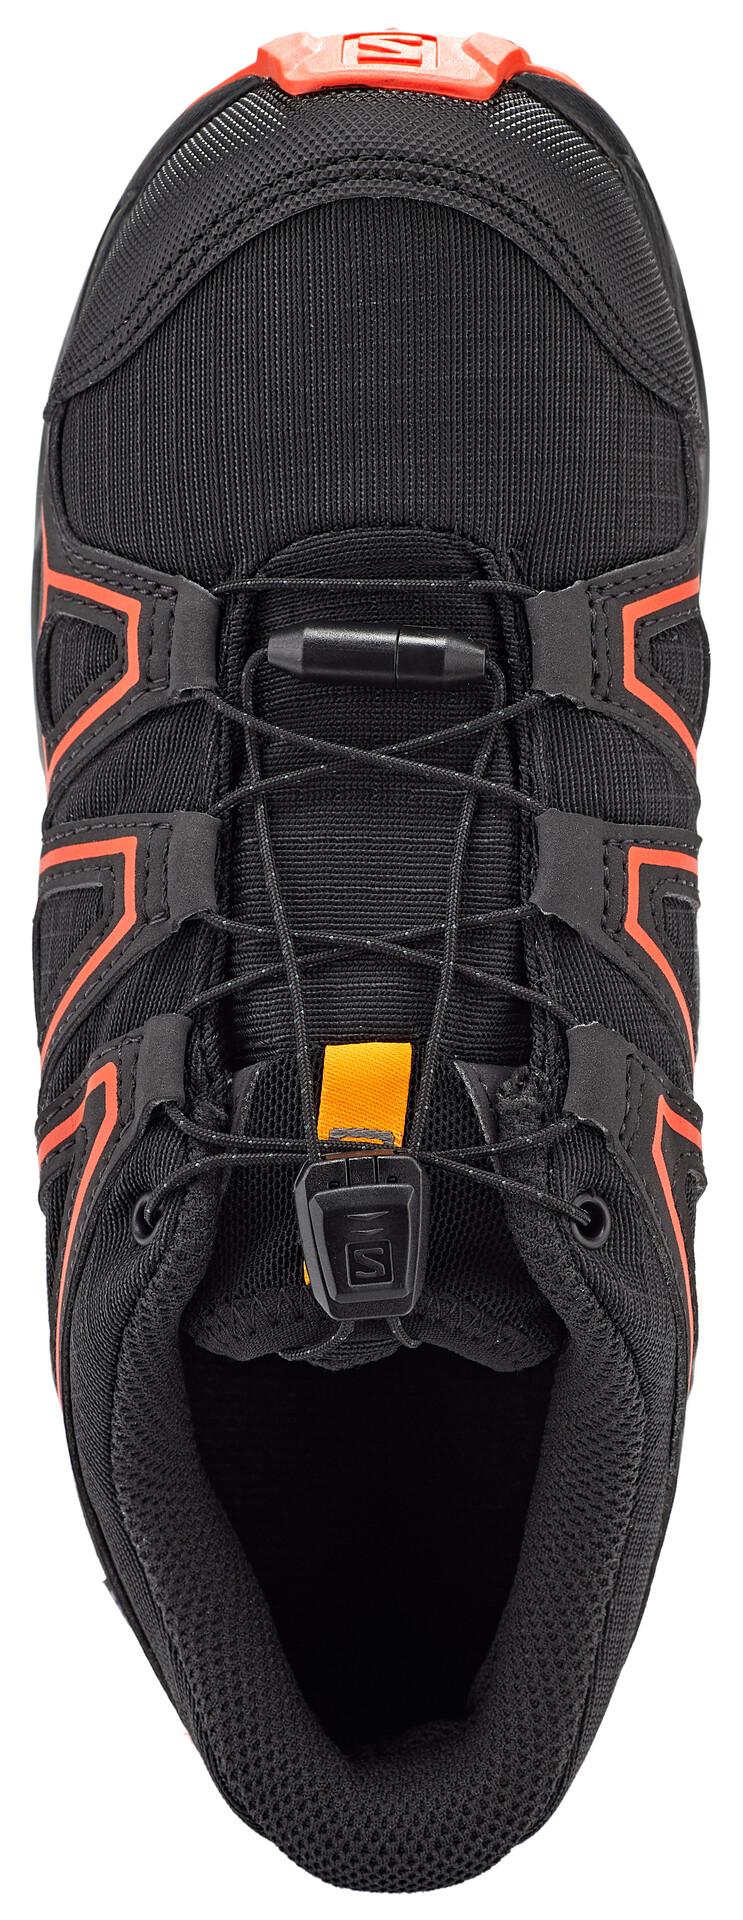 Salomon Speedcross CSWP Chaussures Enfant, blacktangelocherry tomato